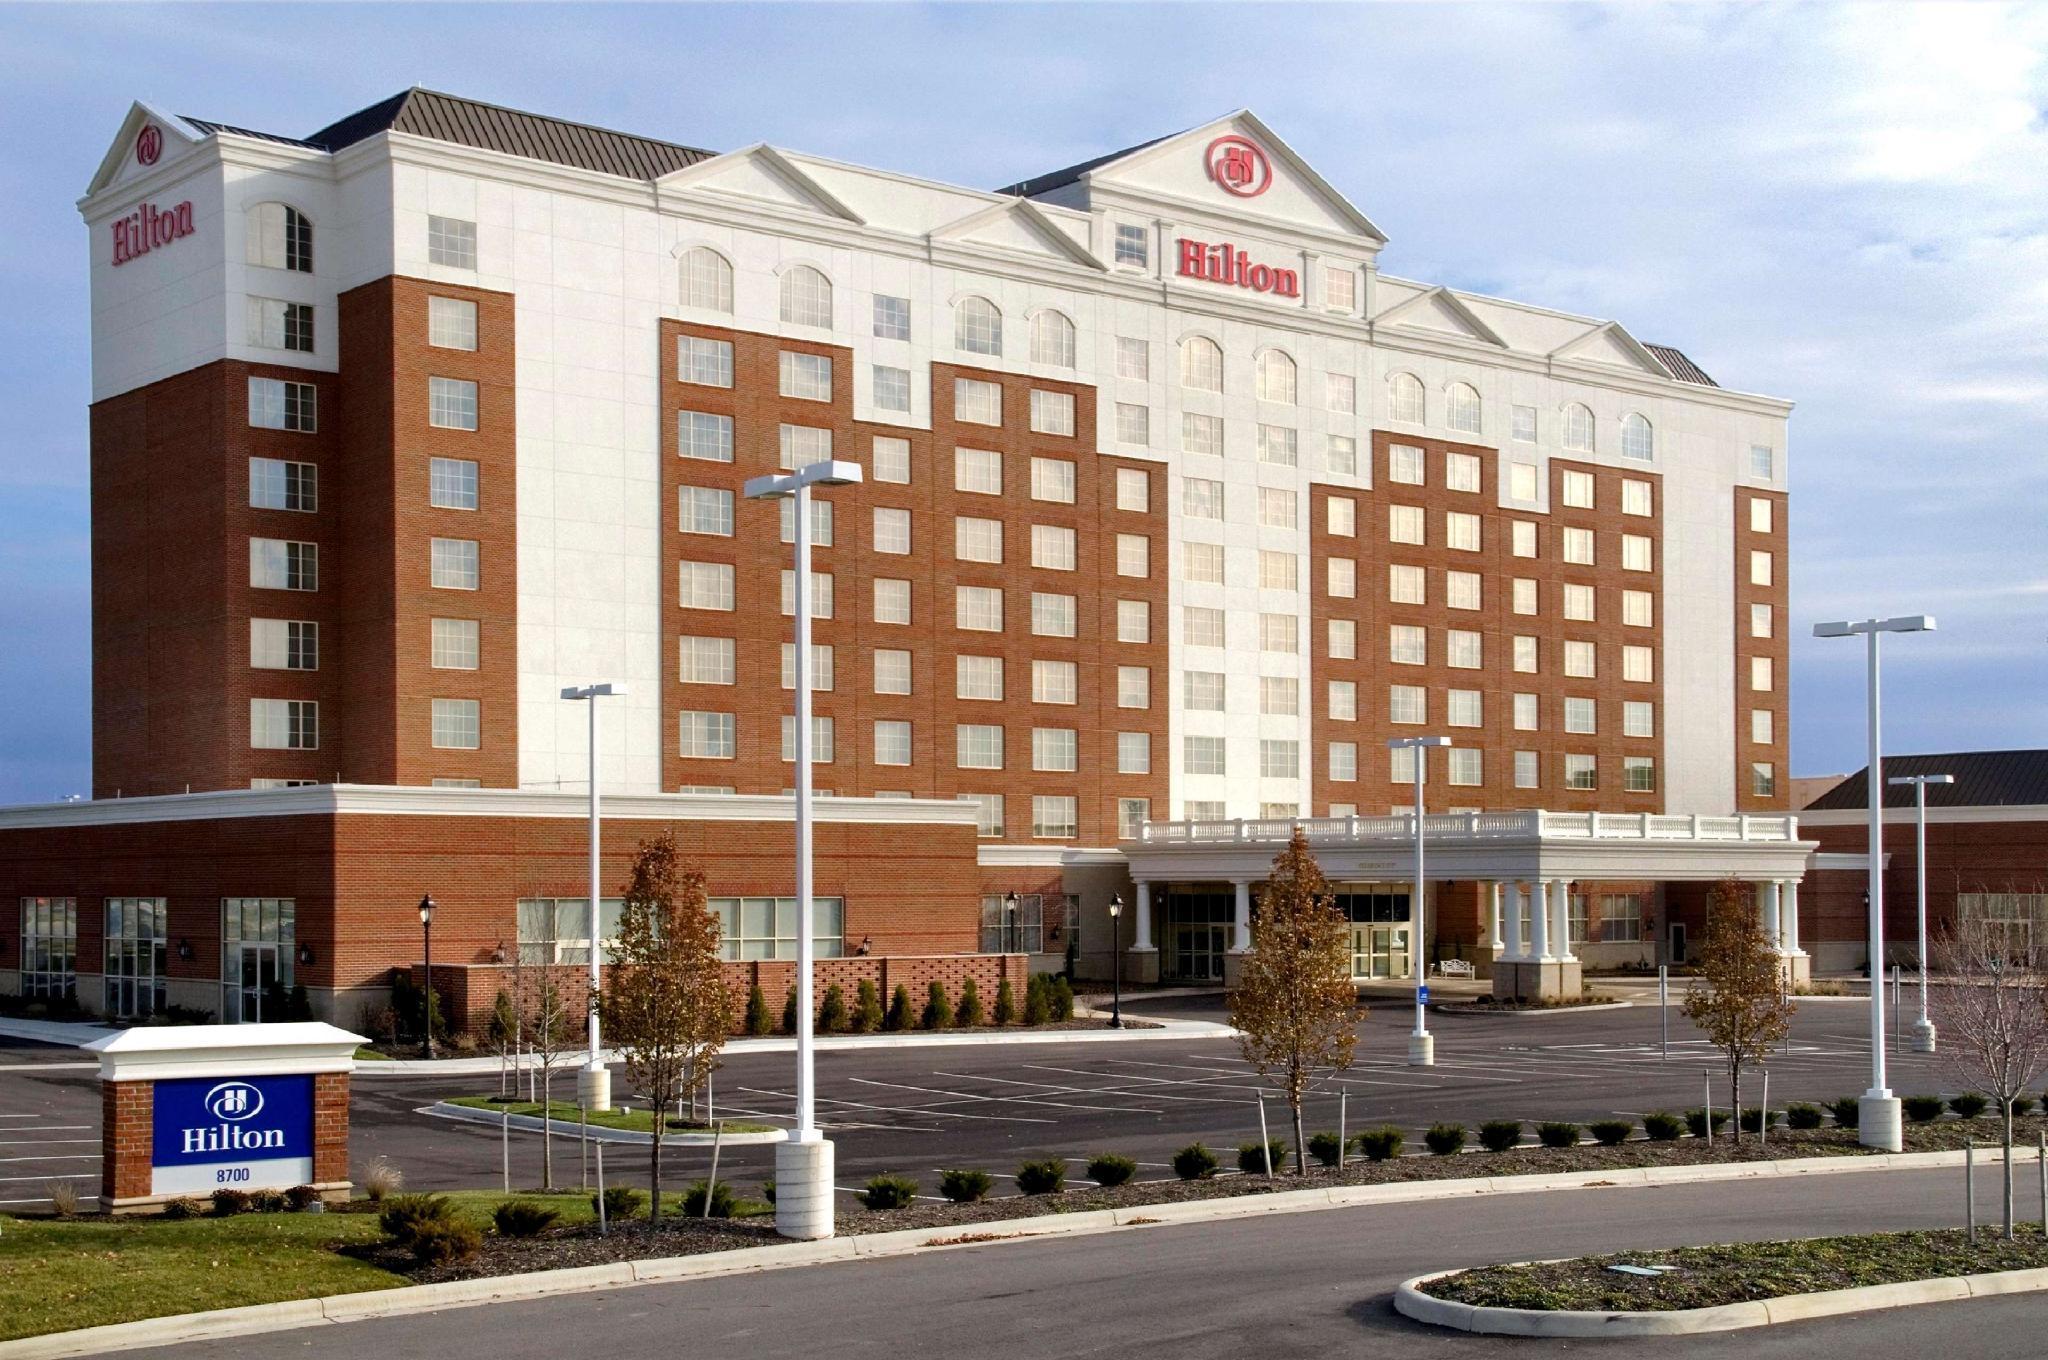 Hilton Columbus Polaris Hotel